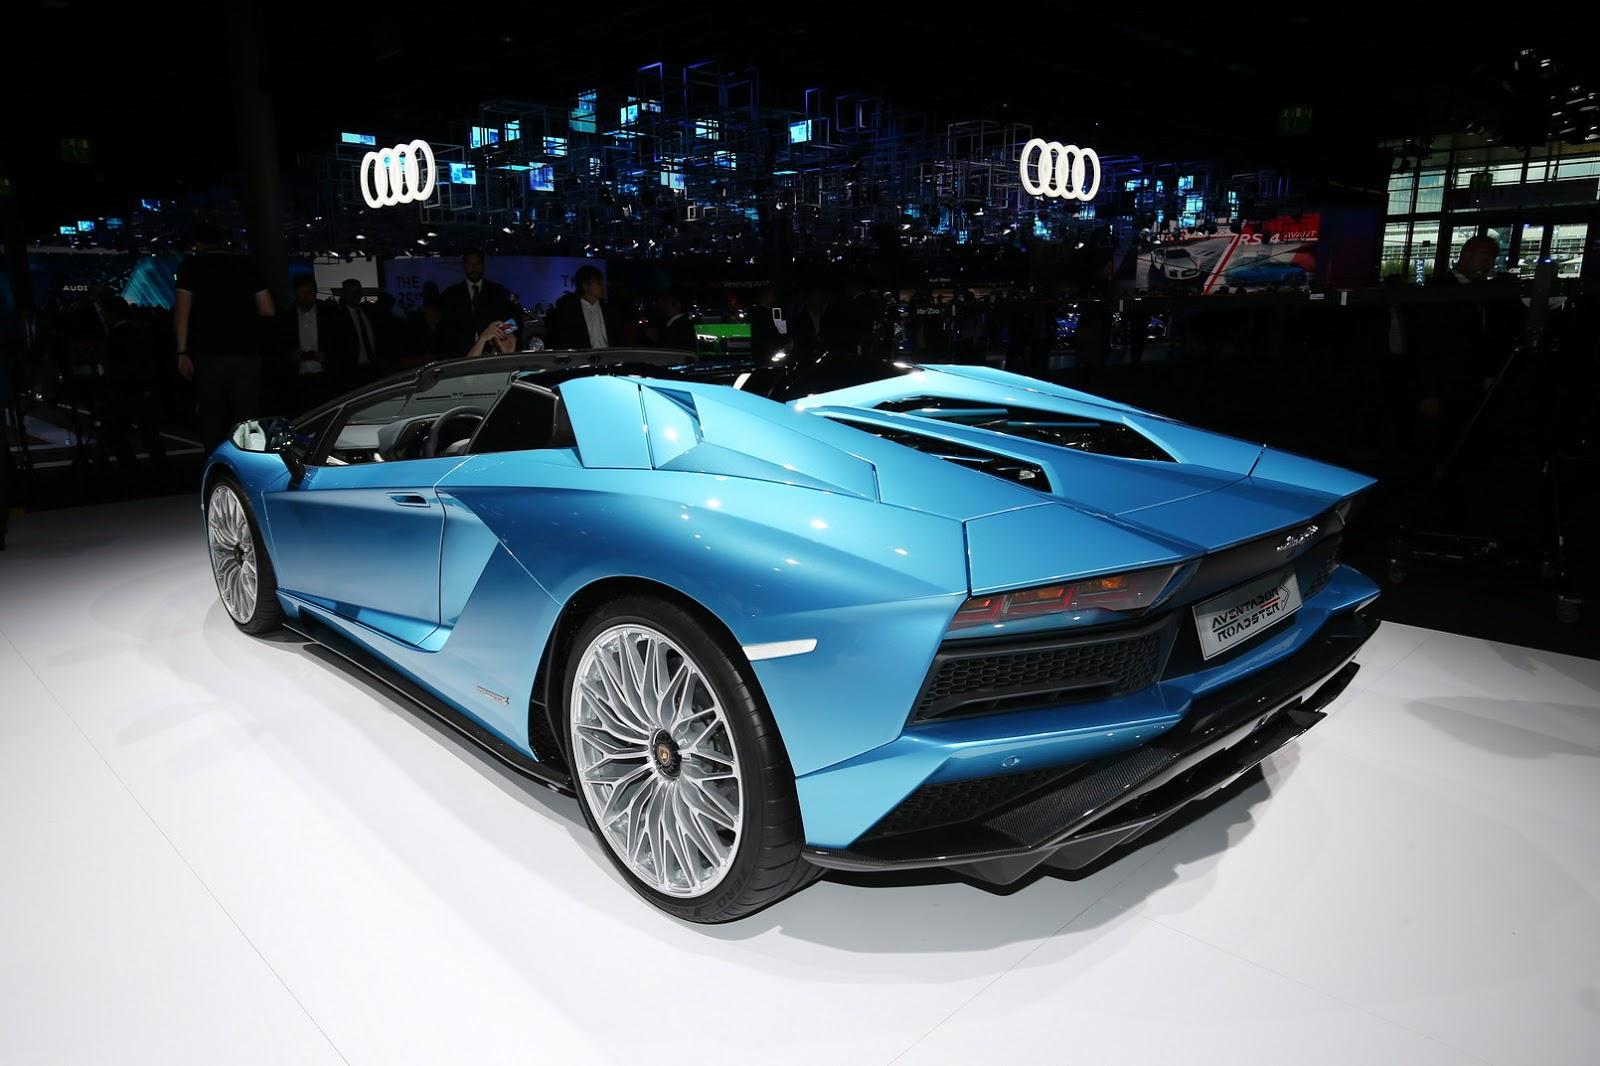 Lamborghini Aventador Roadster S facelift (21)